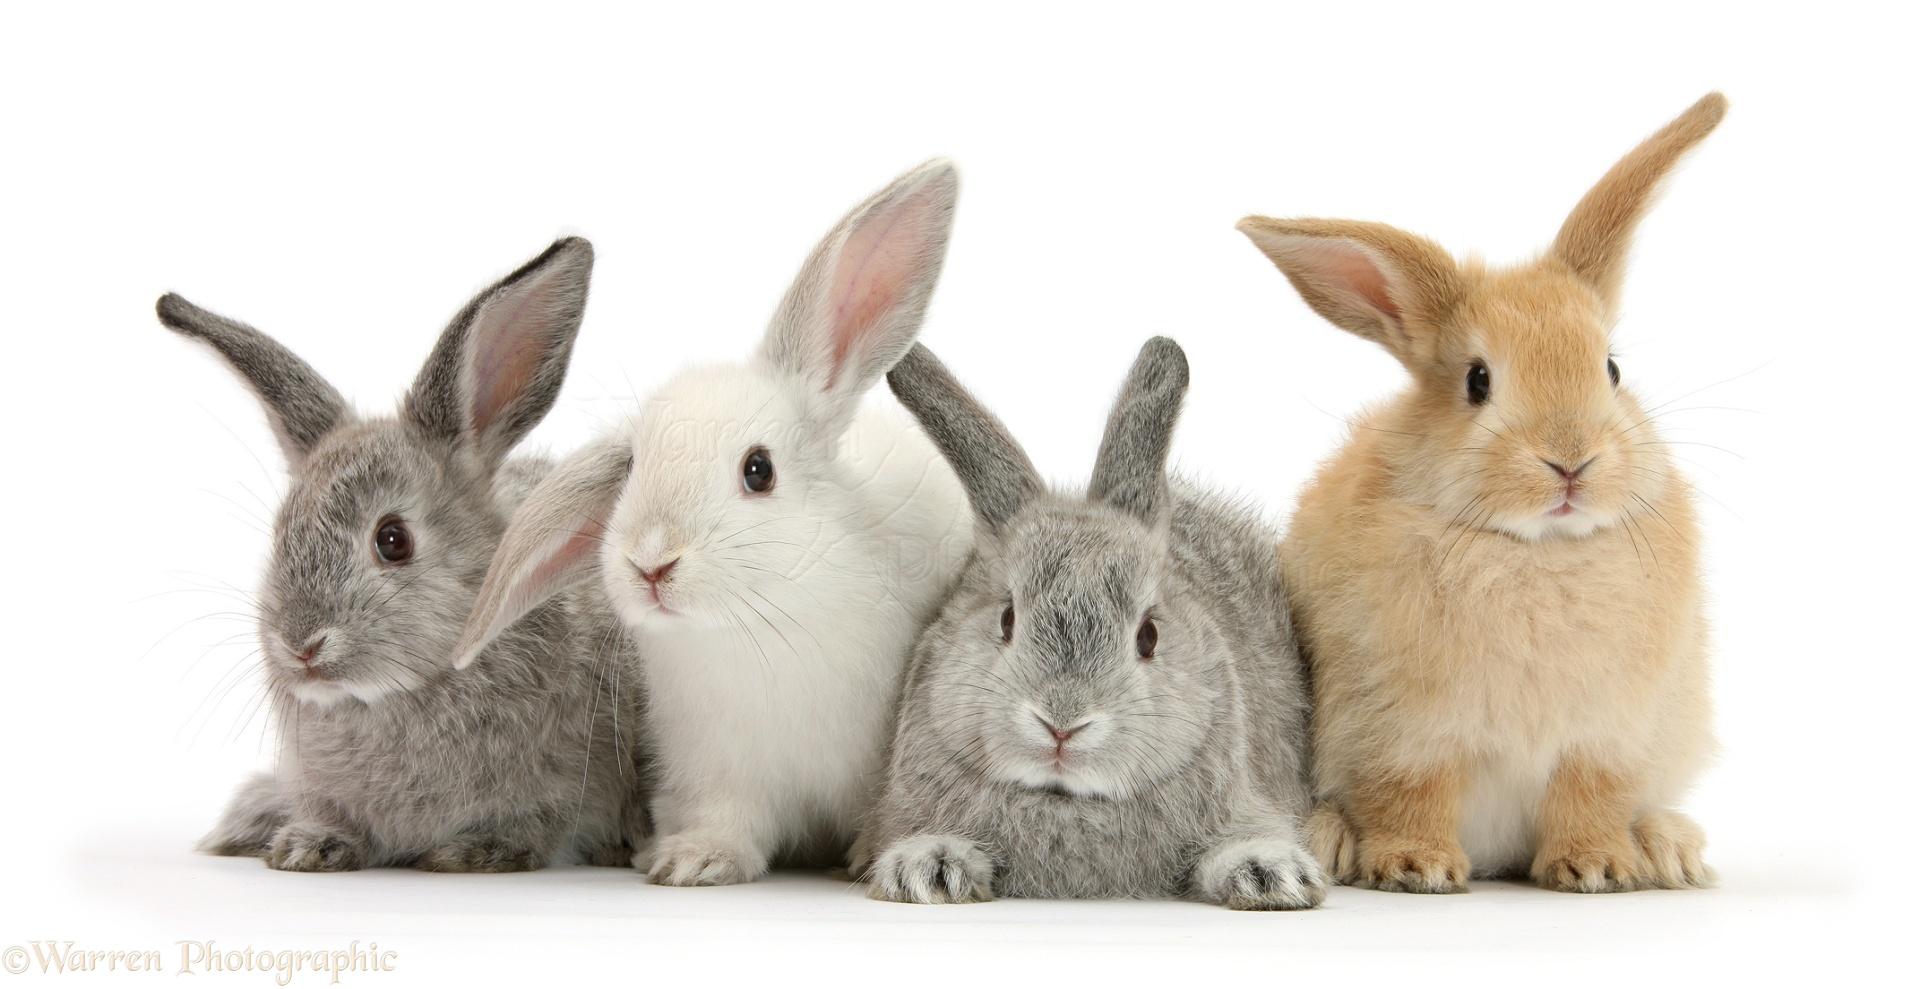 Four baby rabbits photo - WP27060